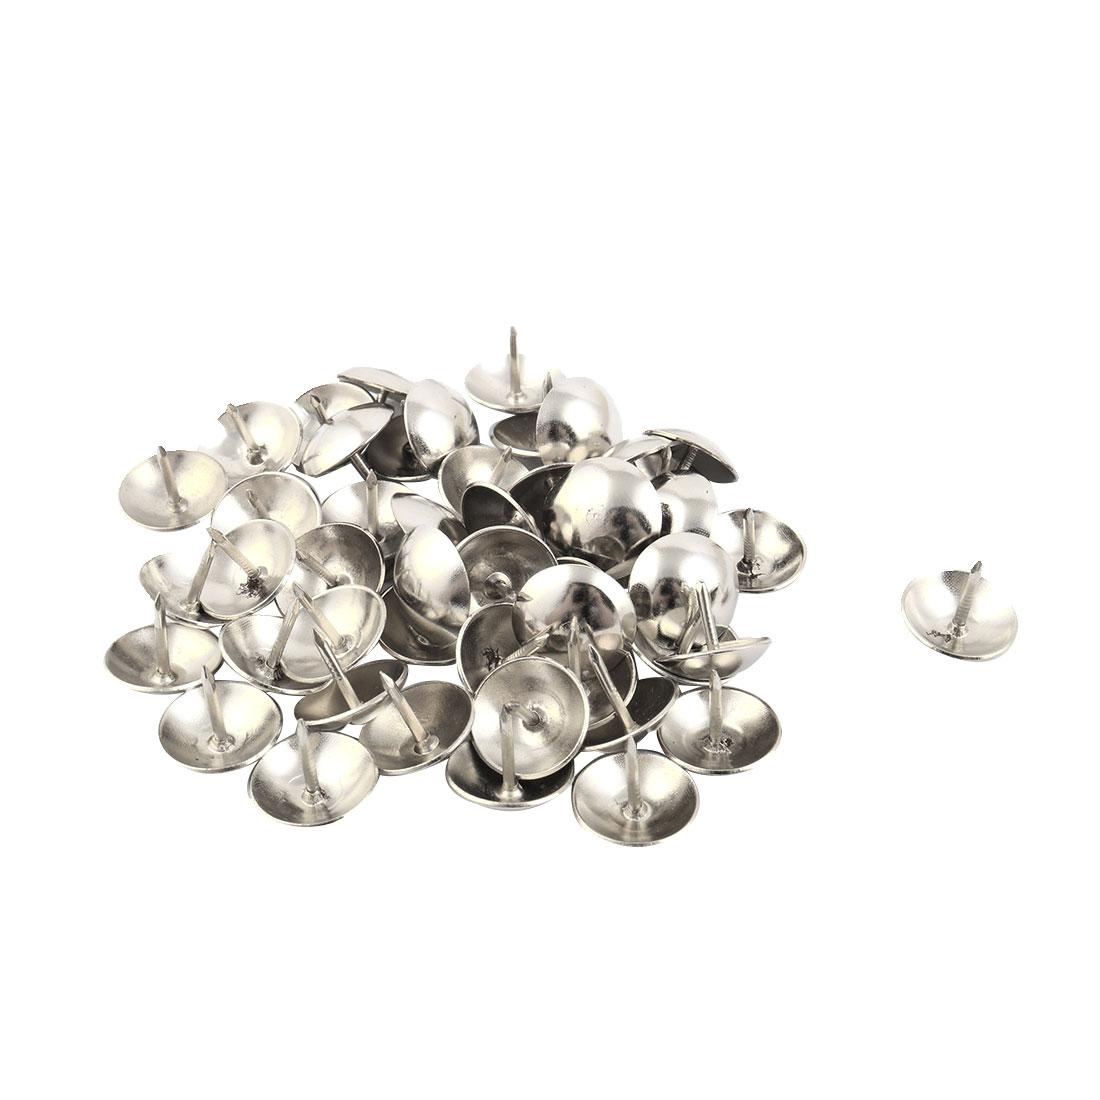 Furniture Metal Tack Nail Multifunction Pushpin Silver Tone 16 x 14mm 50pcs